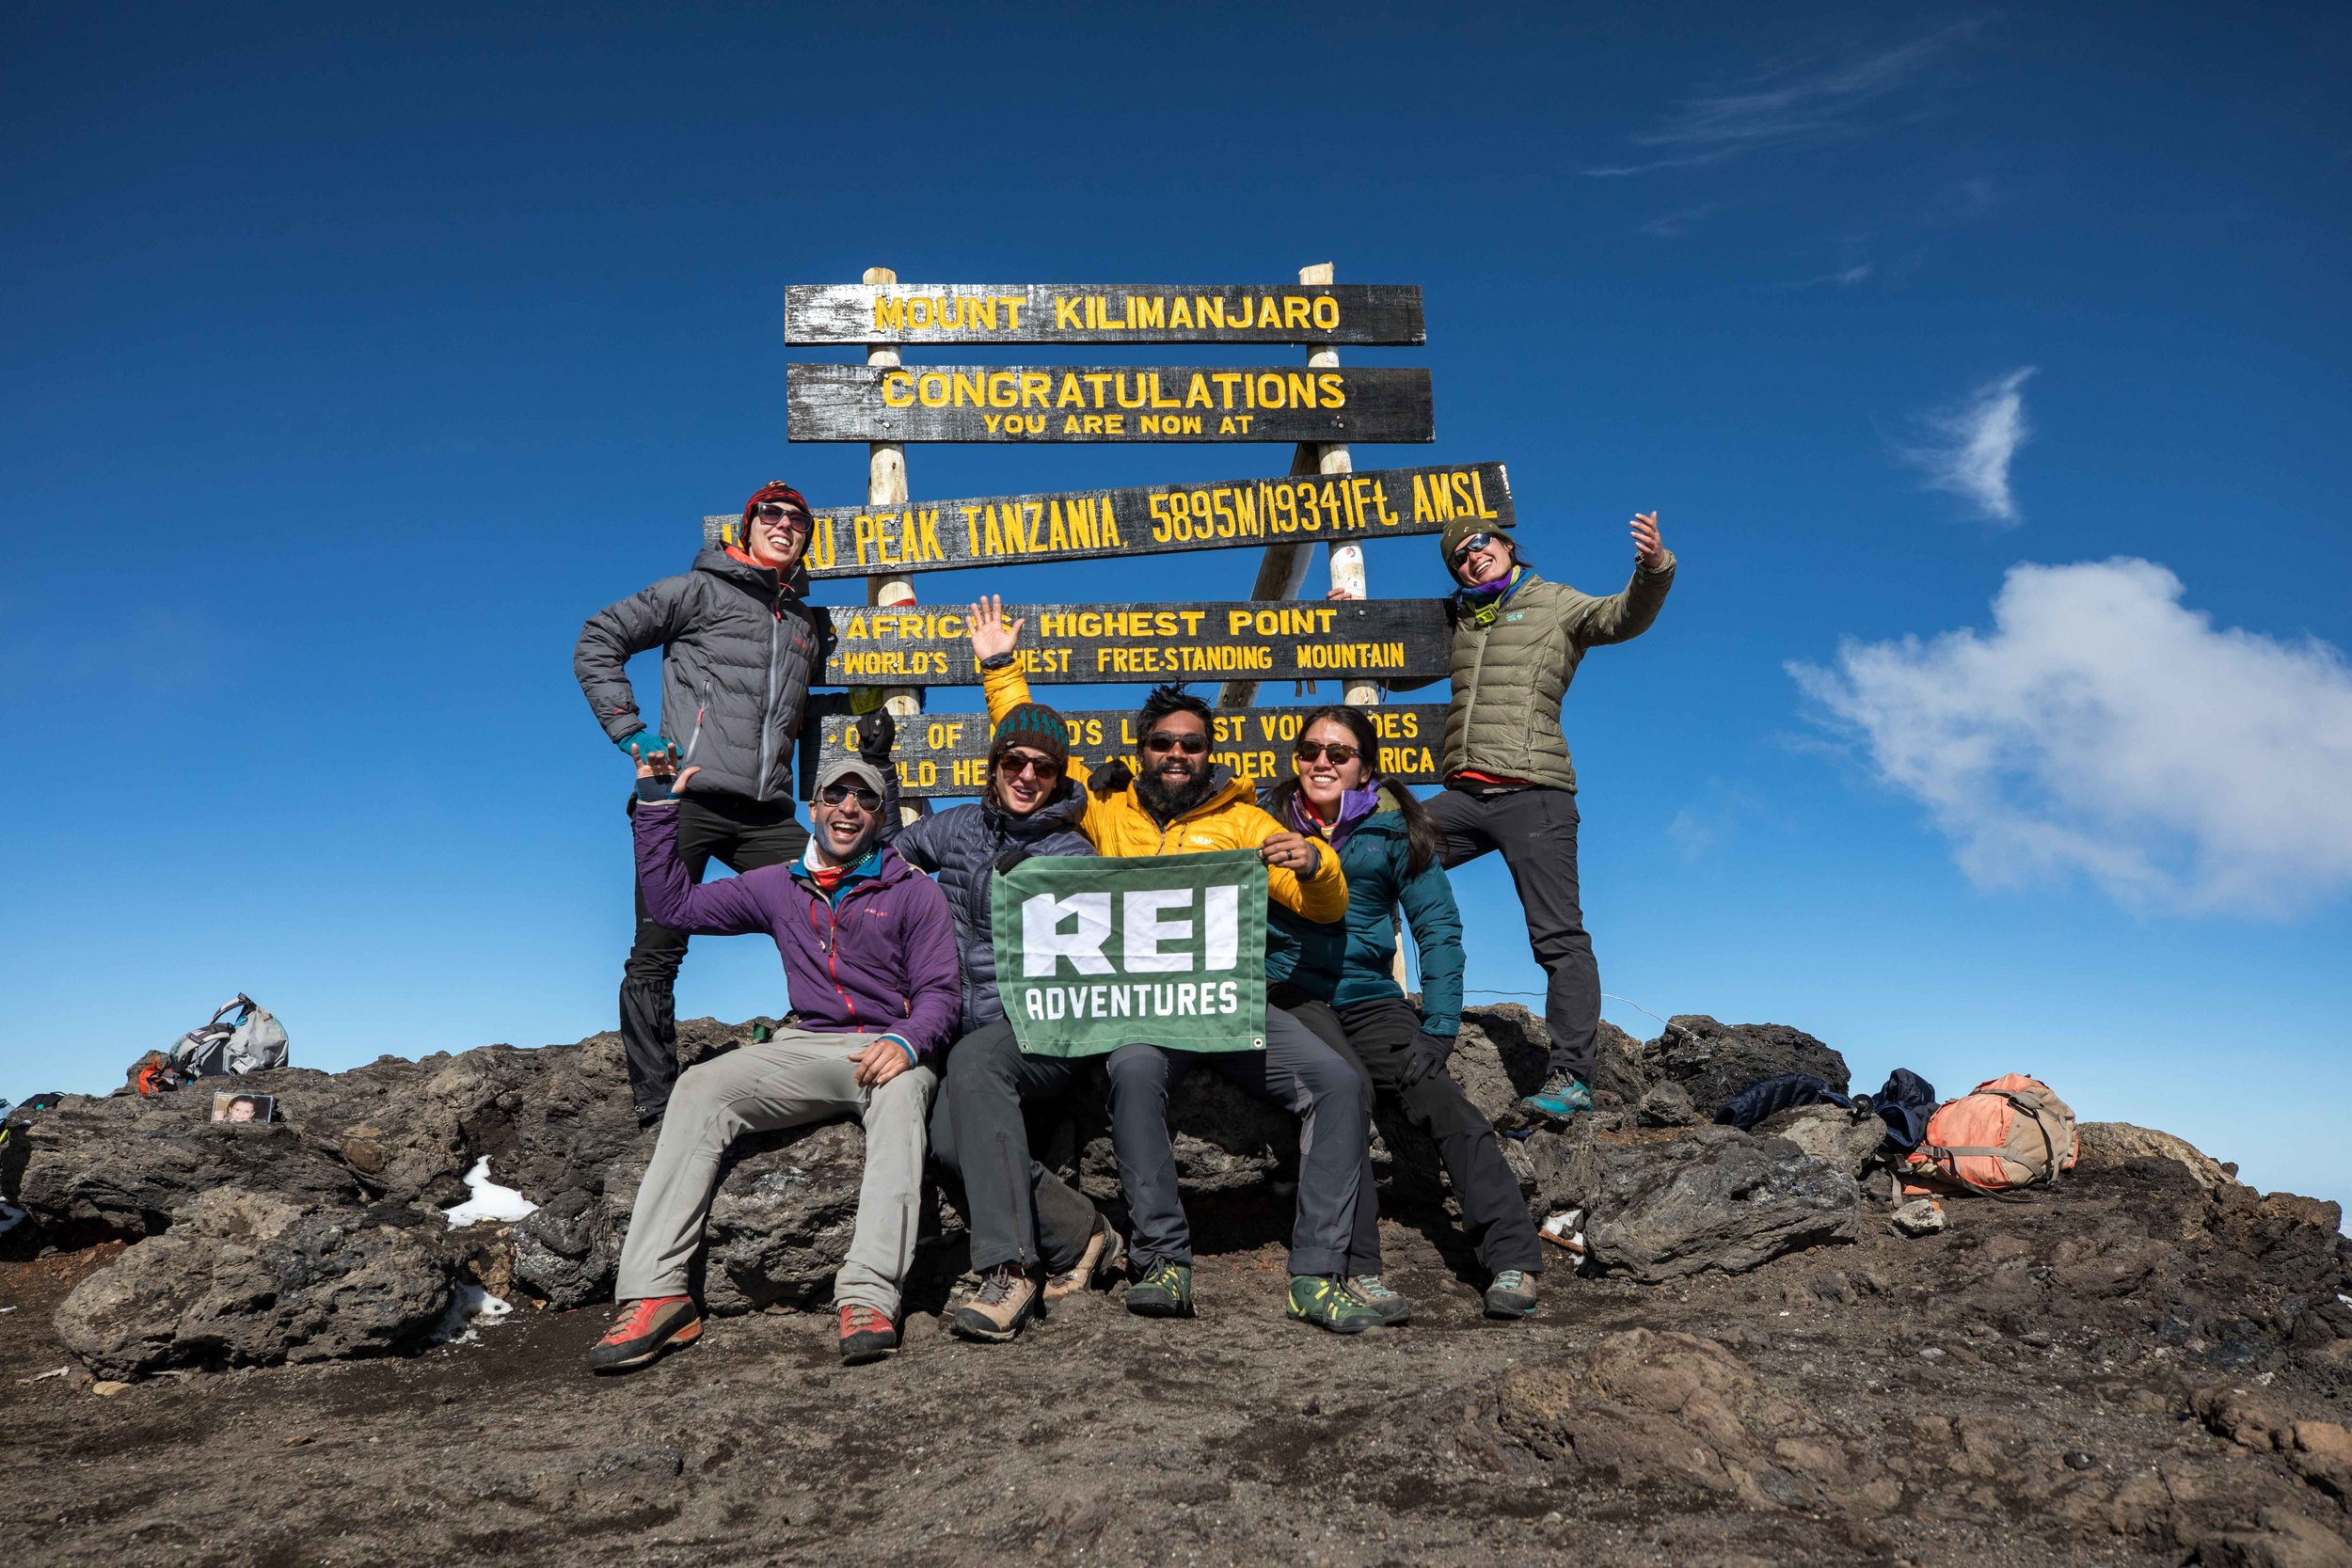 ajw_REI_Kilimanjaro-70.jpg